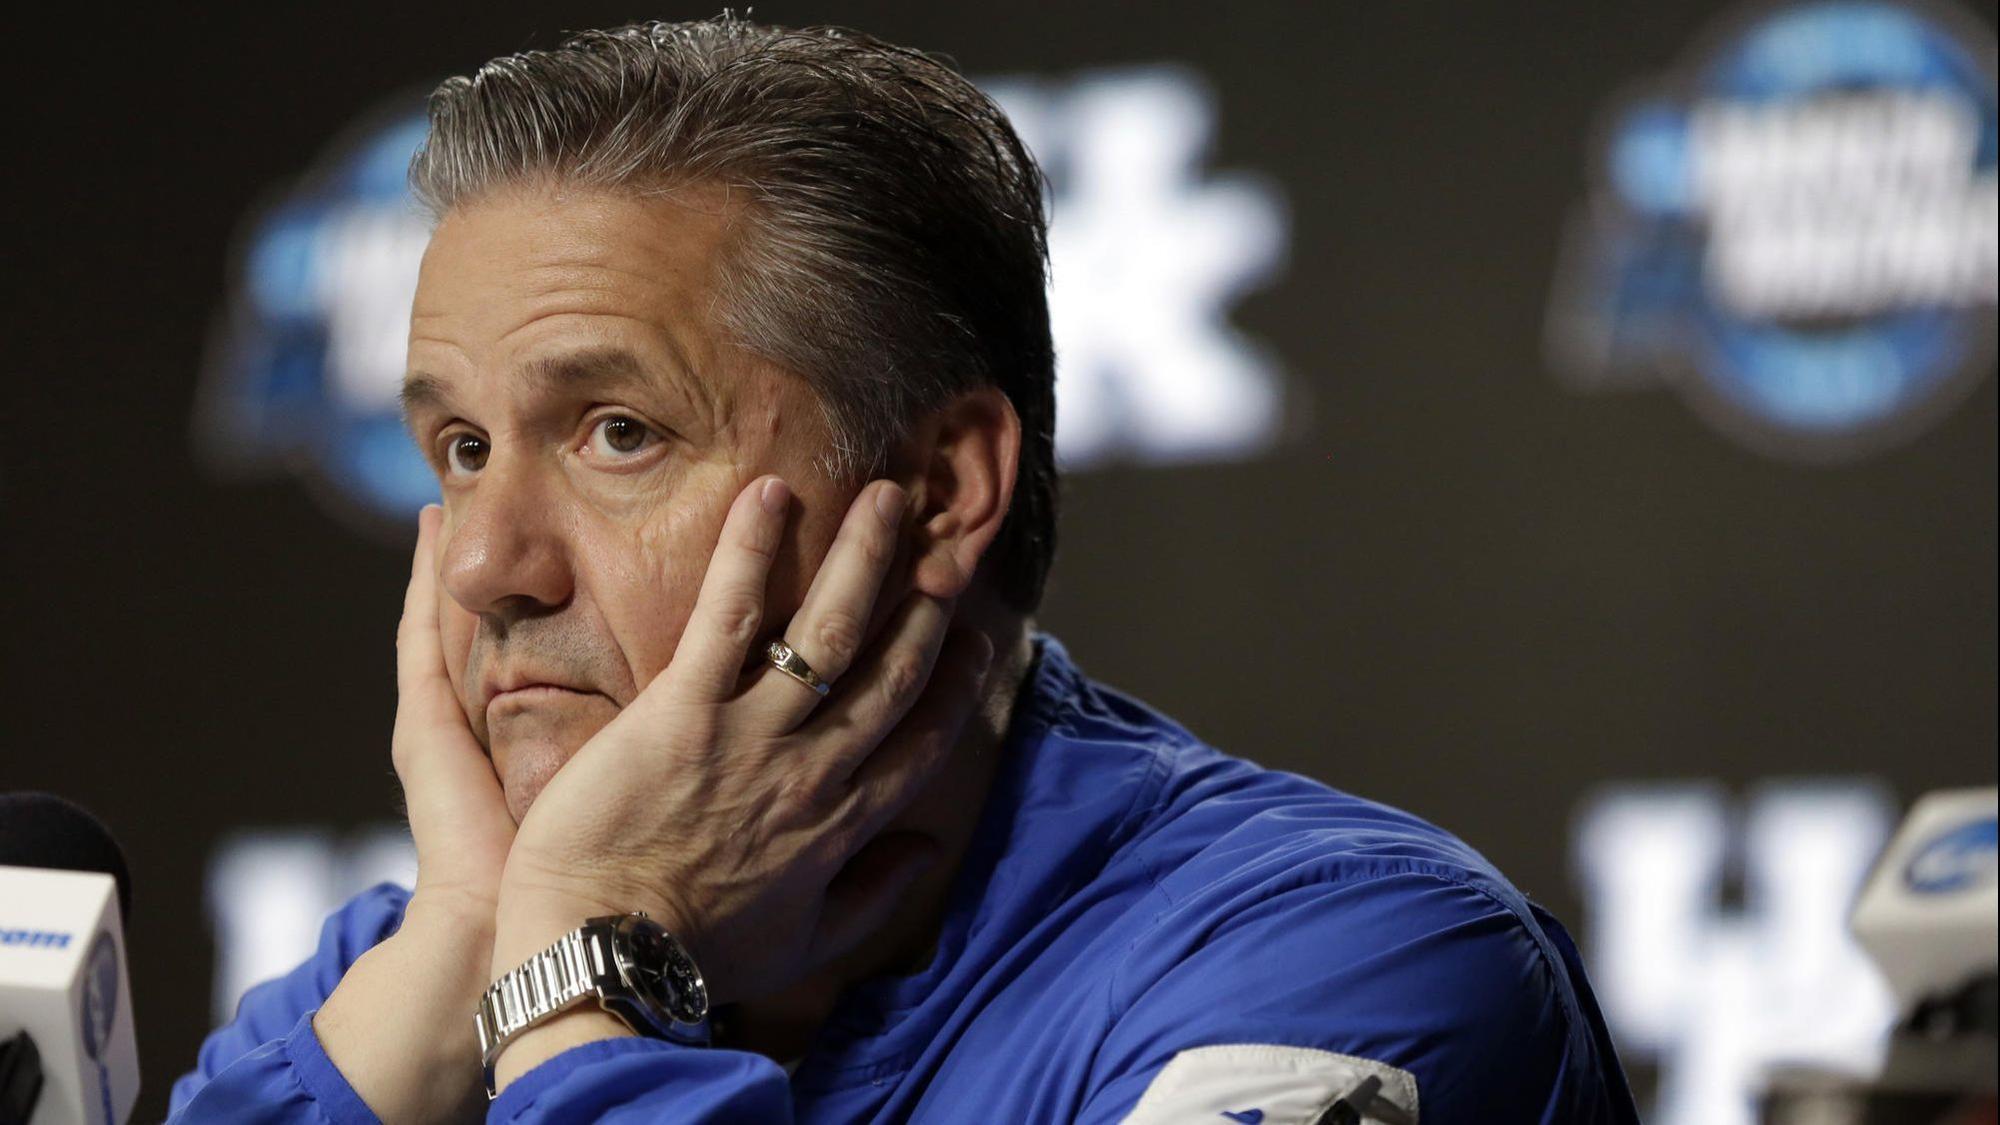 Uk Basketball: John Calipari Jokes About Urinating On Charles Barkley's